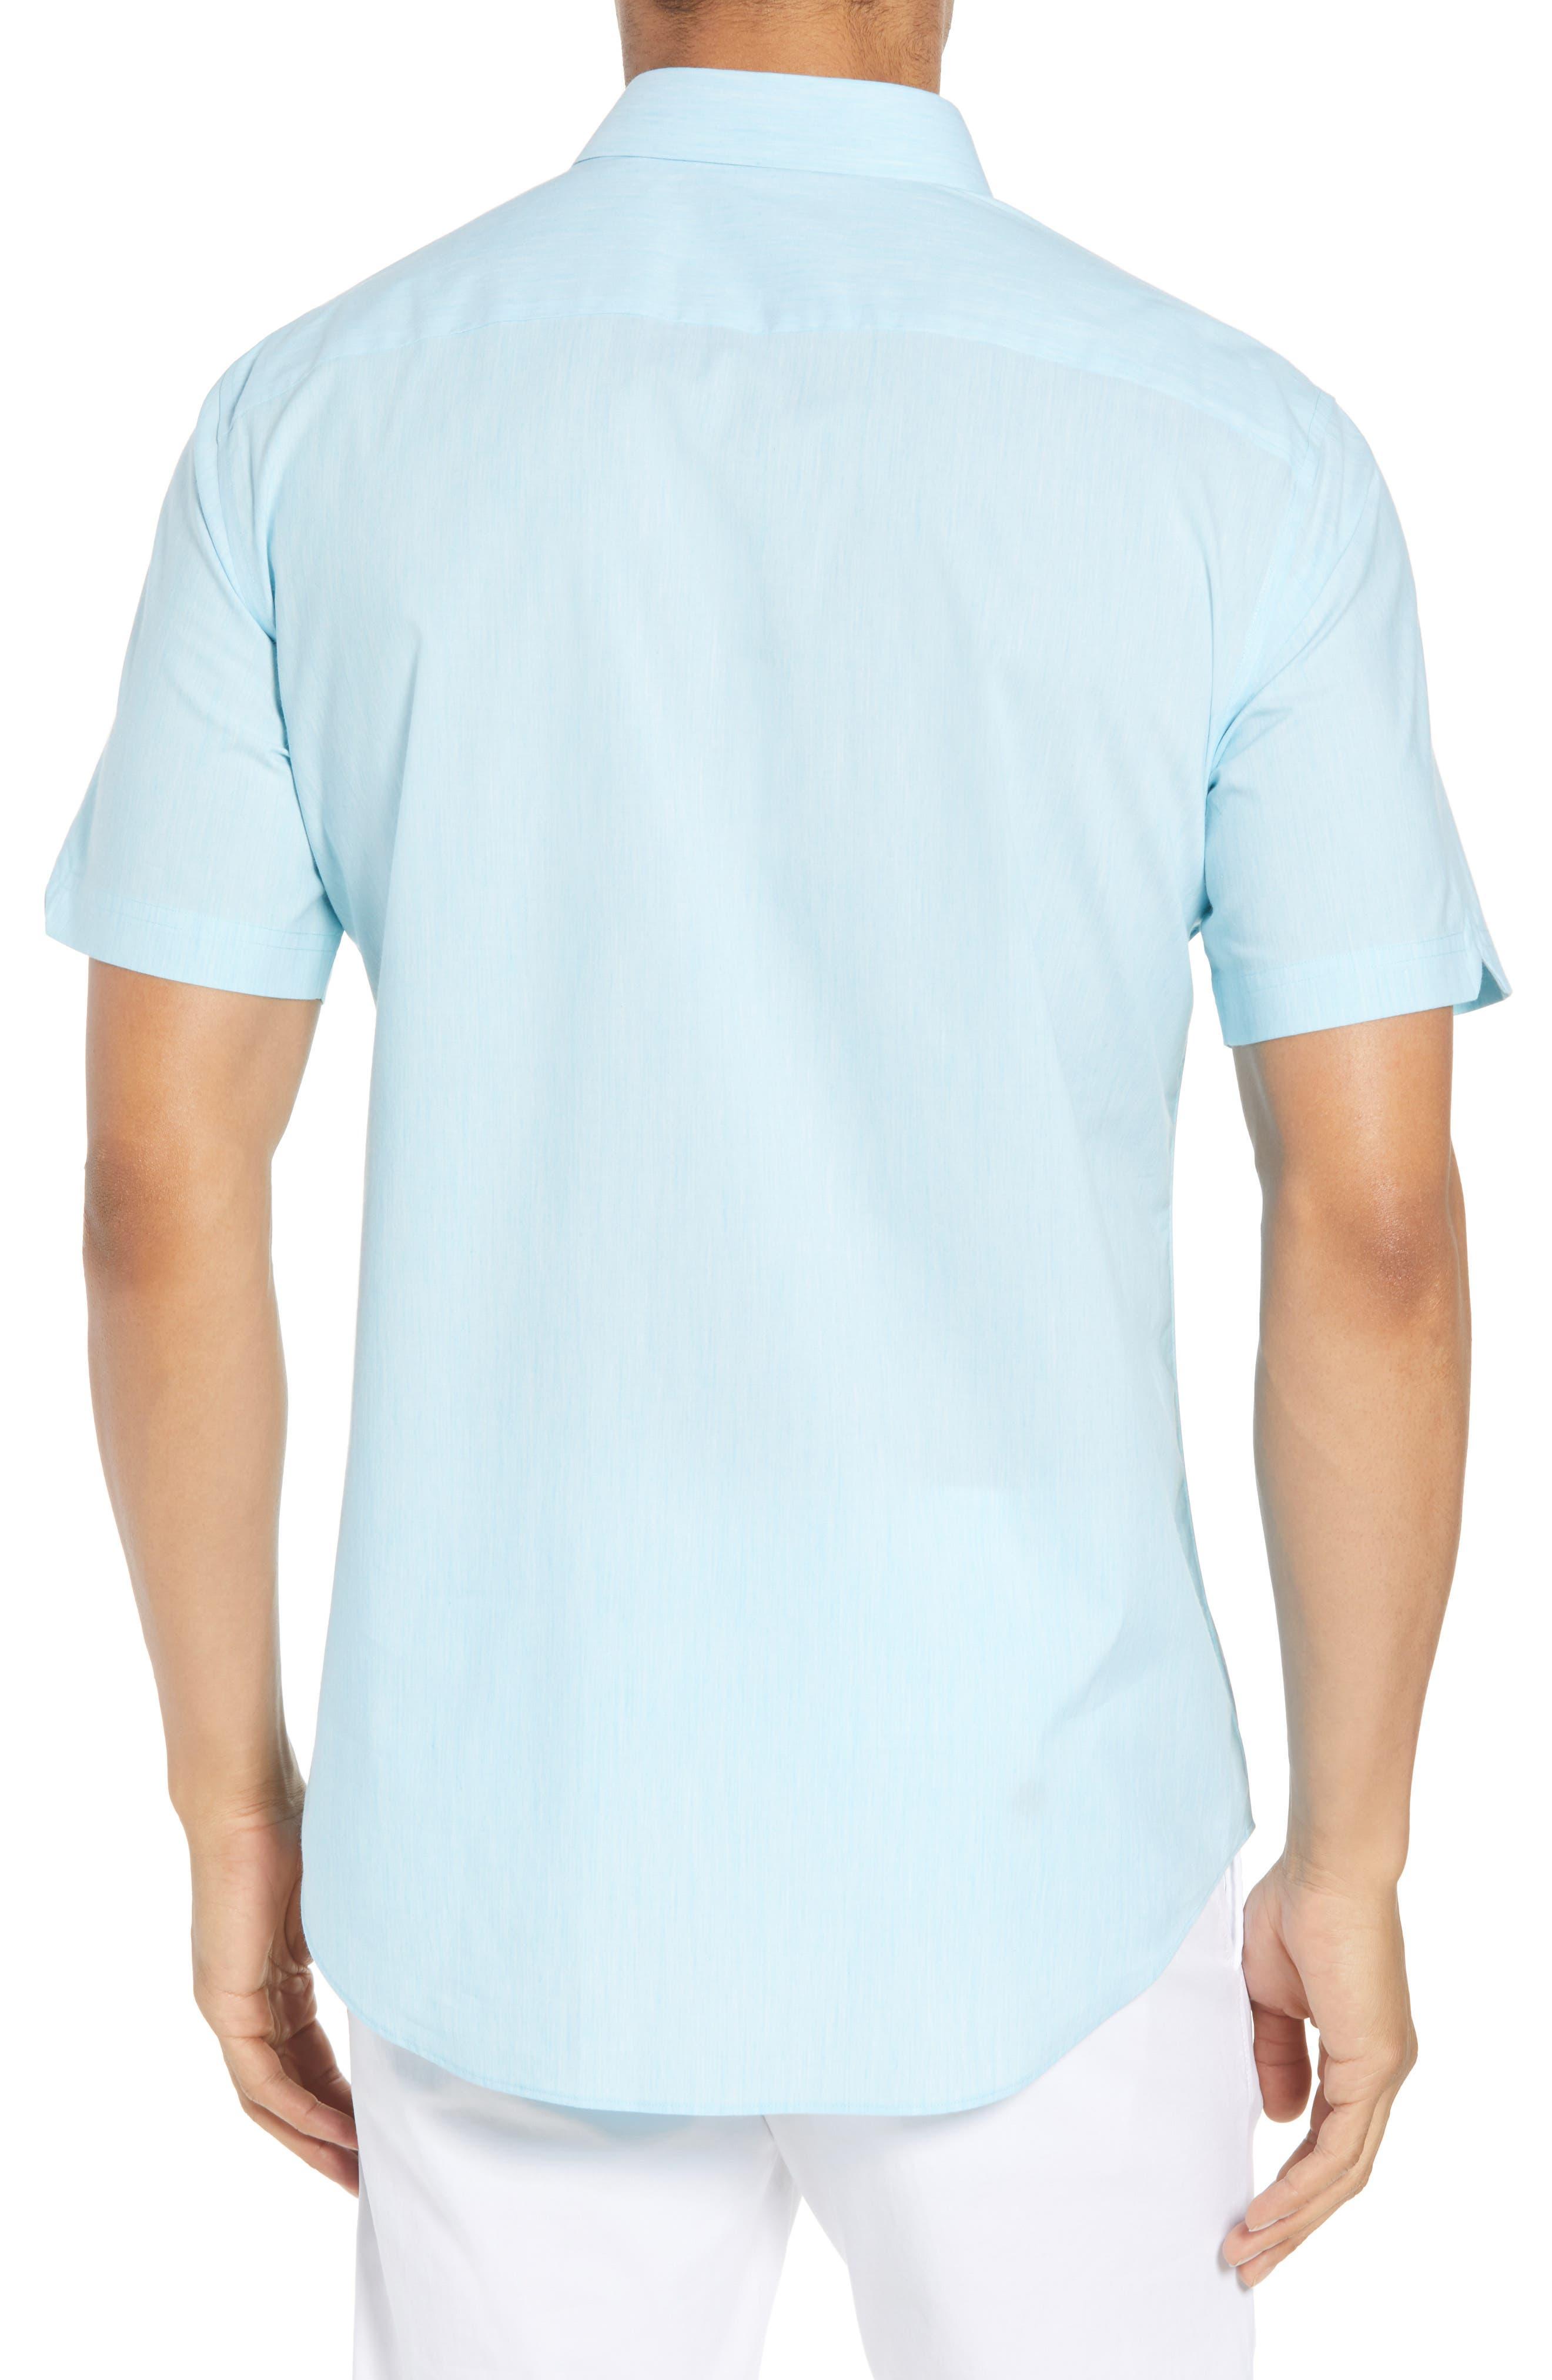 Baumann Slim Fit Sport Shirt,                             Alternate thumbnail 2, color,                             Aqua